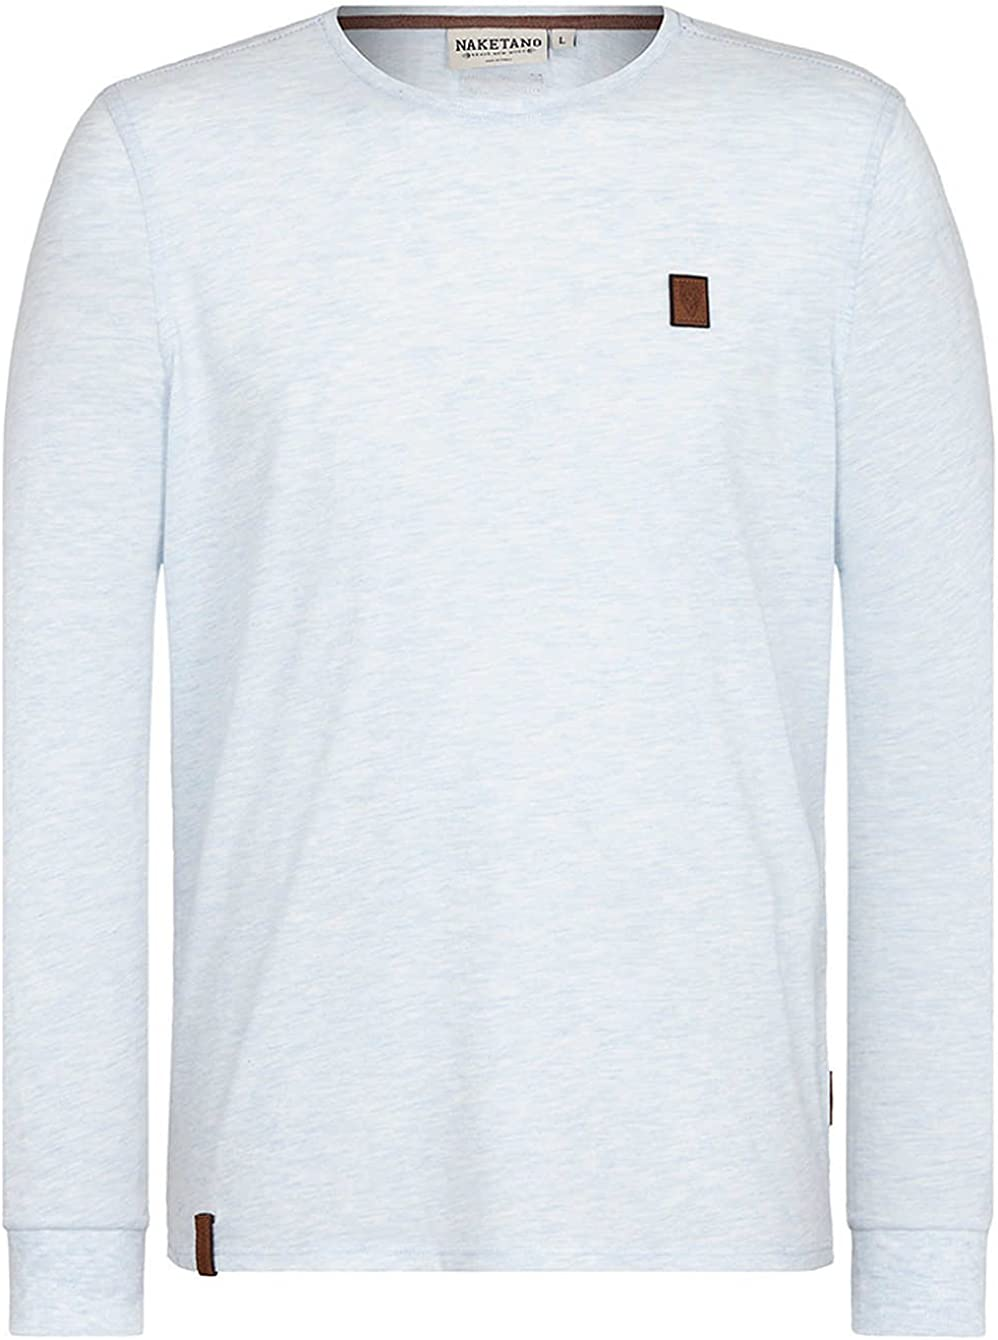 Naketano Kommt ein Dünnschiss Herren Sweatshirt